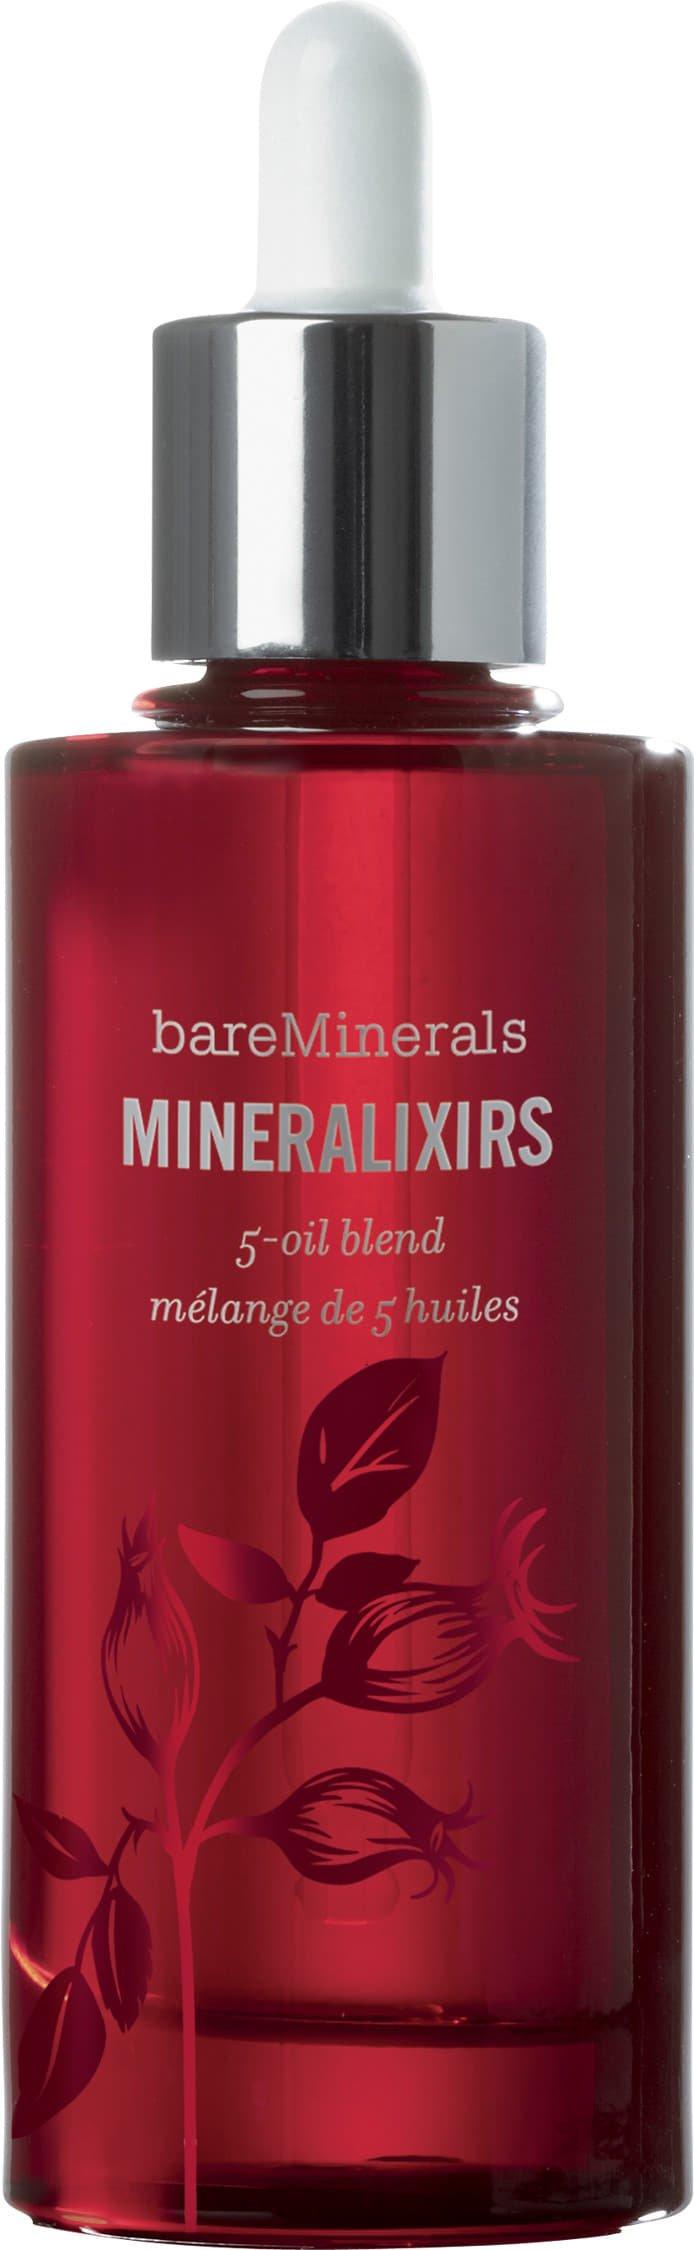 bareMinerals Mineralixirs Five Oil Blend